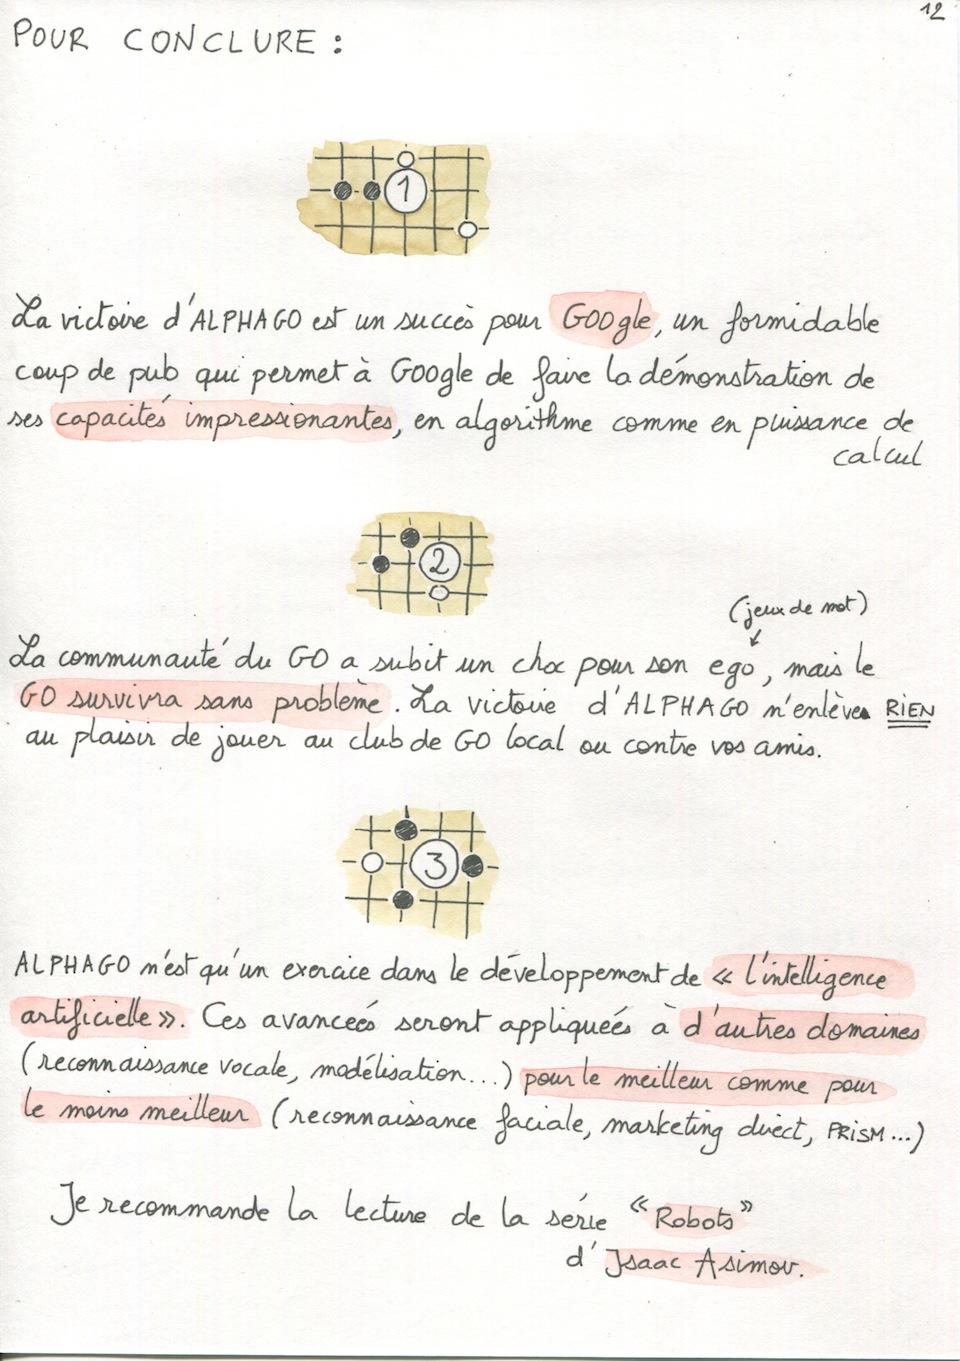 alphago-google-12